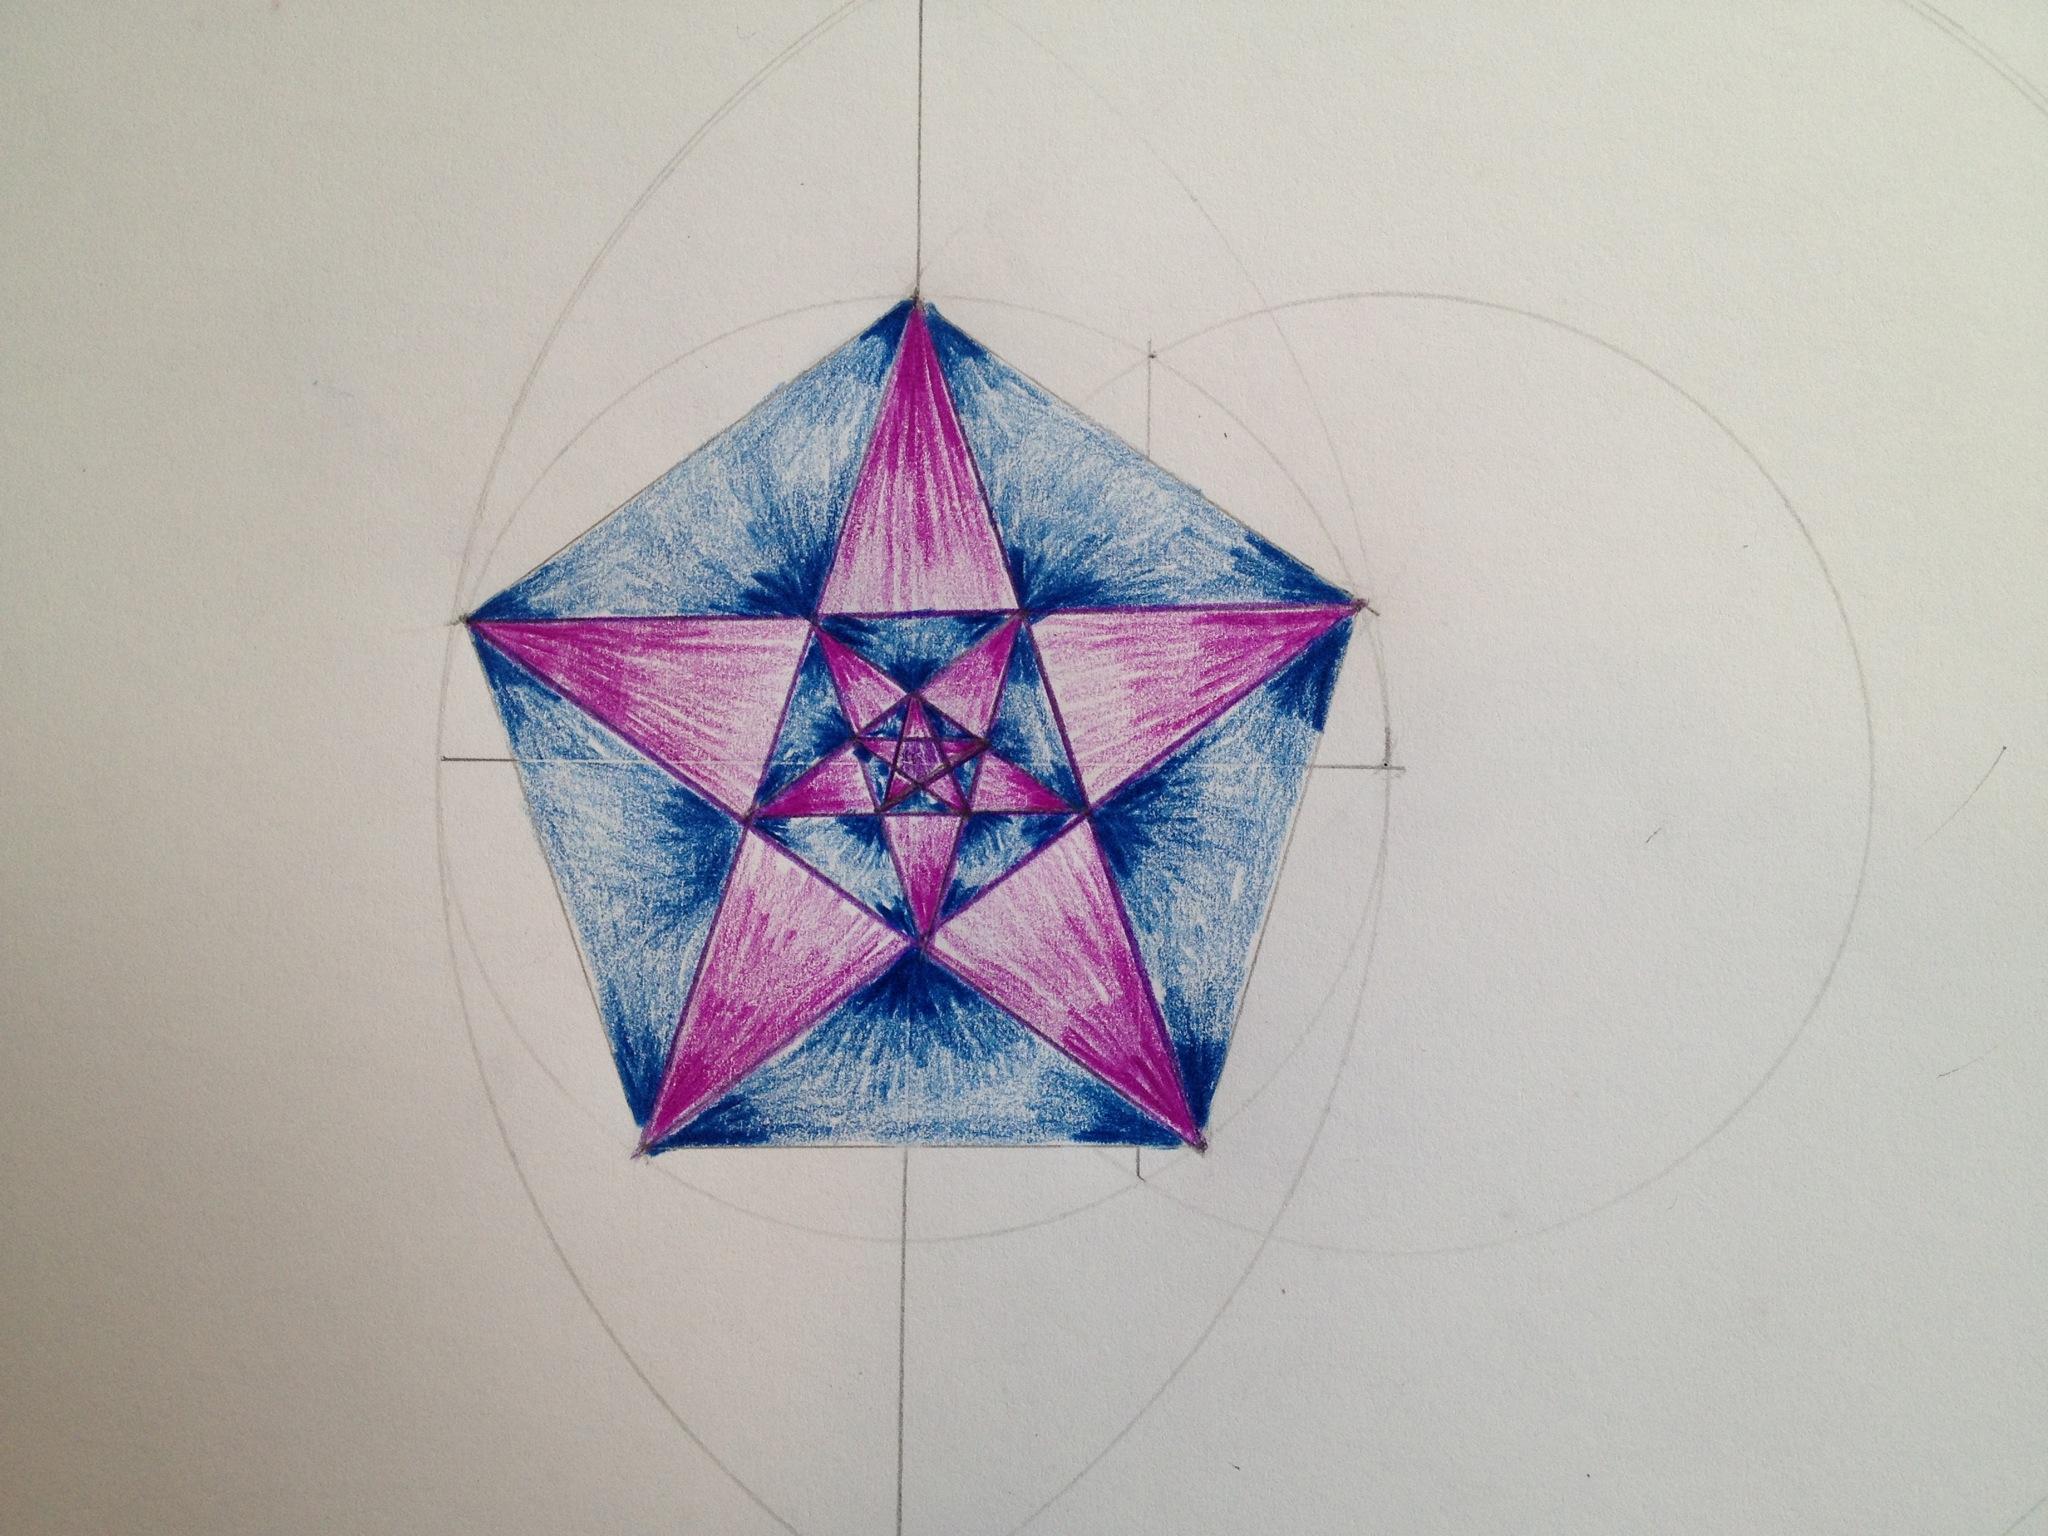 2048x1536 Pentagon And Pentagram Star Are Born From A Vesica Piscis. Grade 6